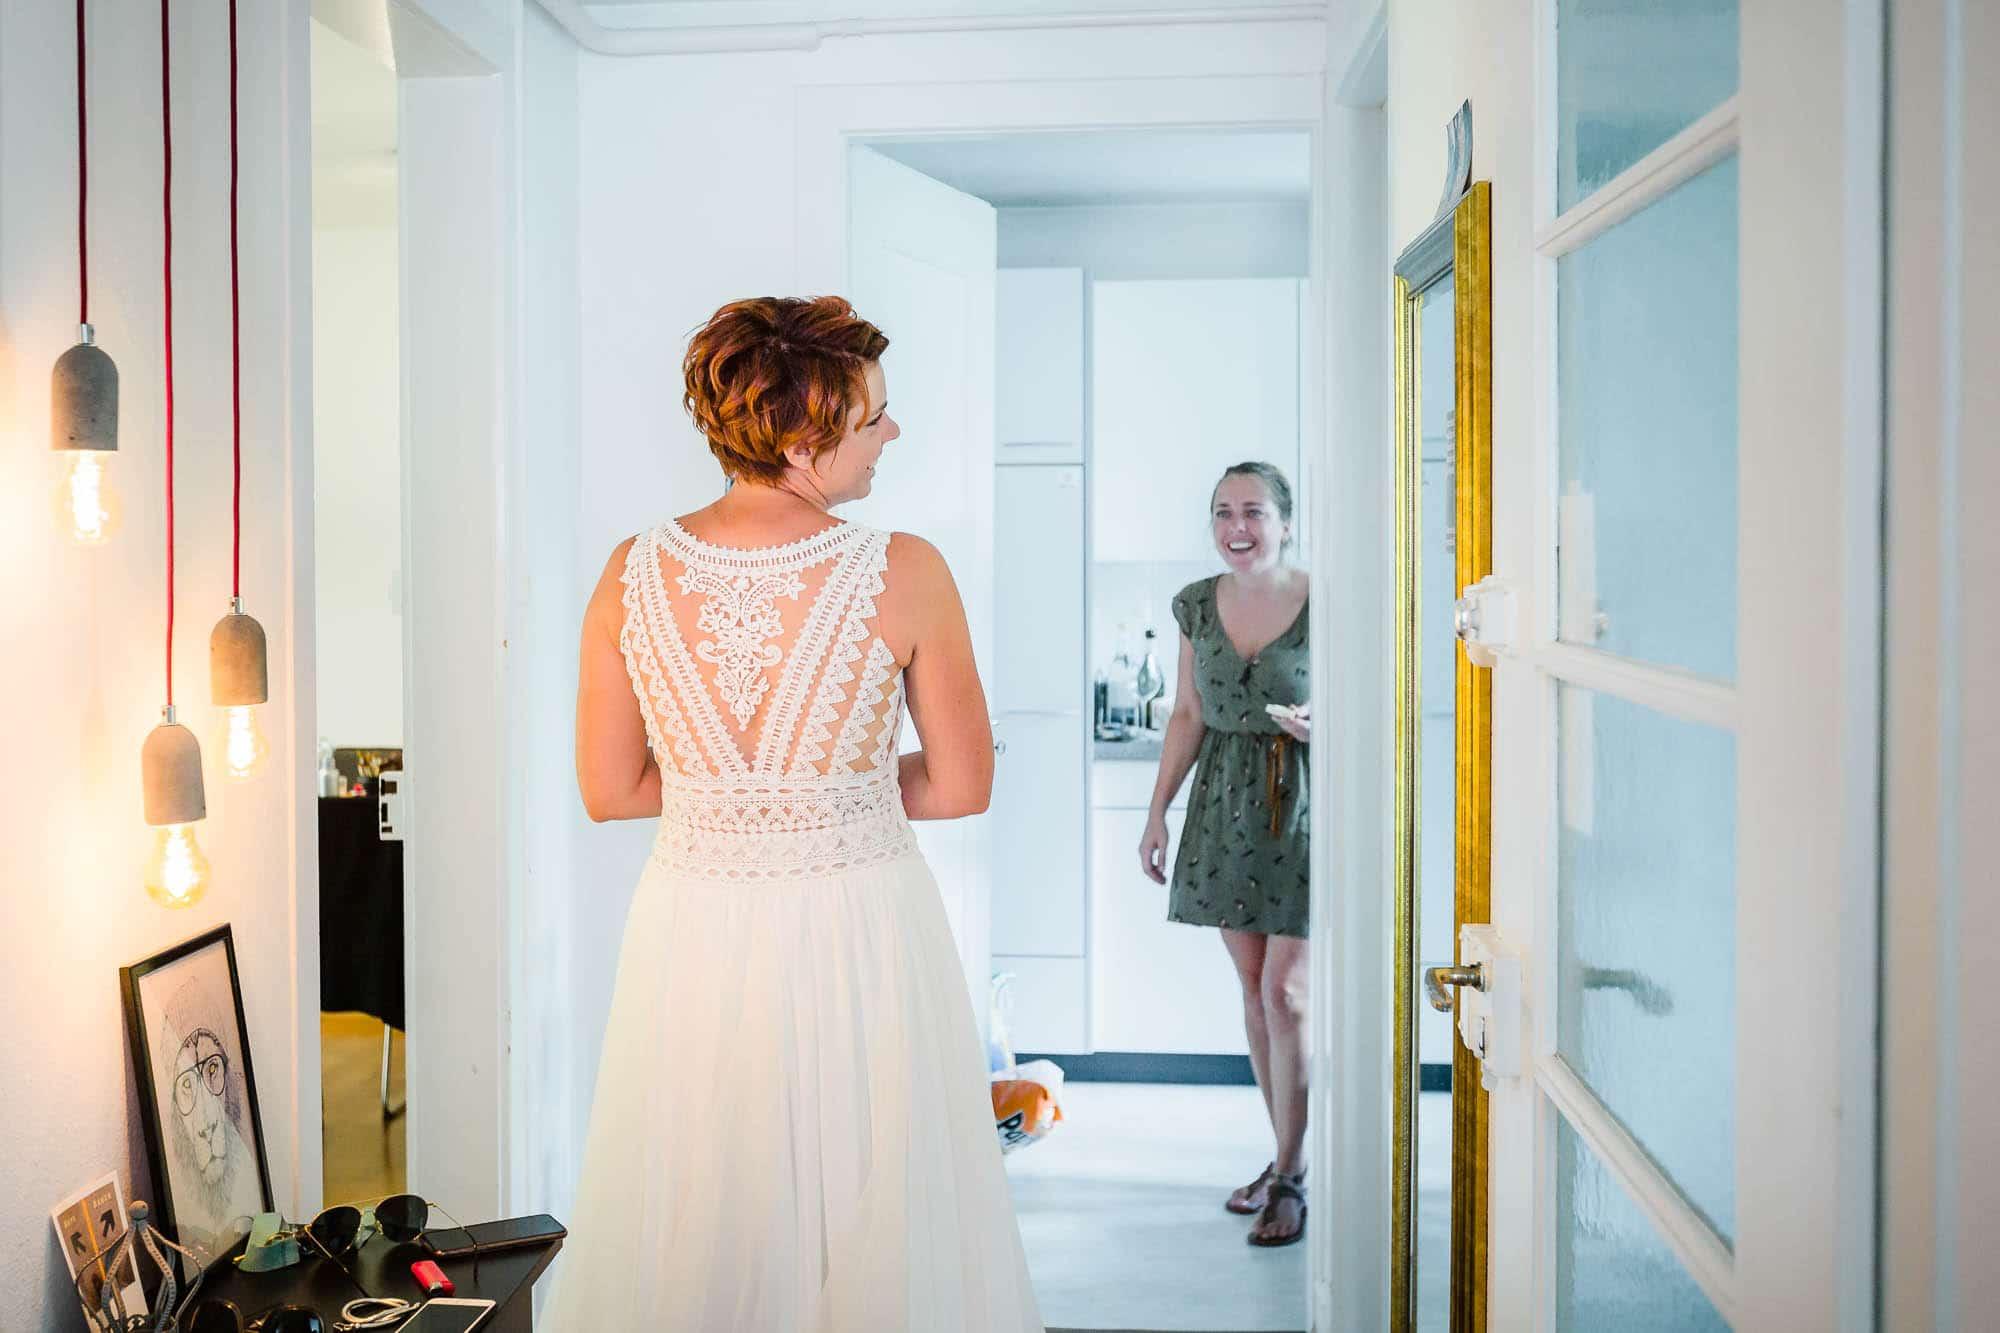 Braut schaut sich im Spiegel an